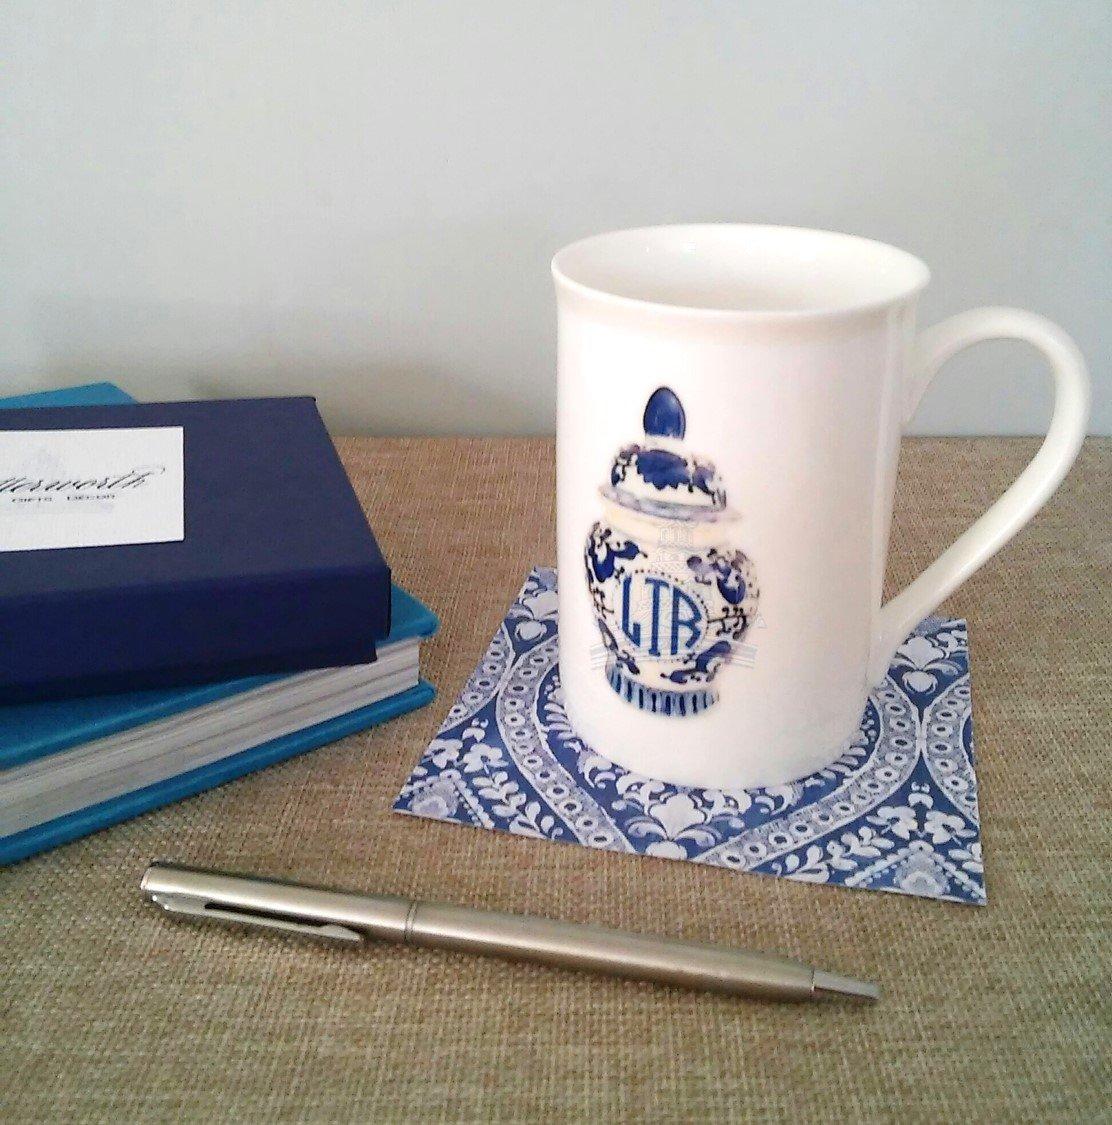 Monogram Ginger Jar Mug by Letterworth